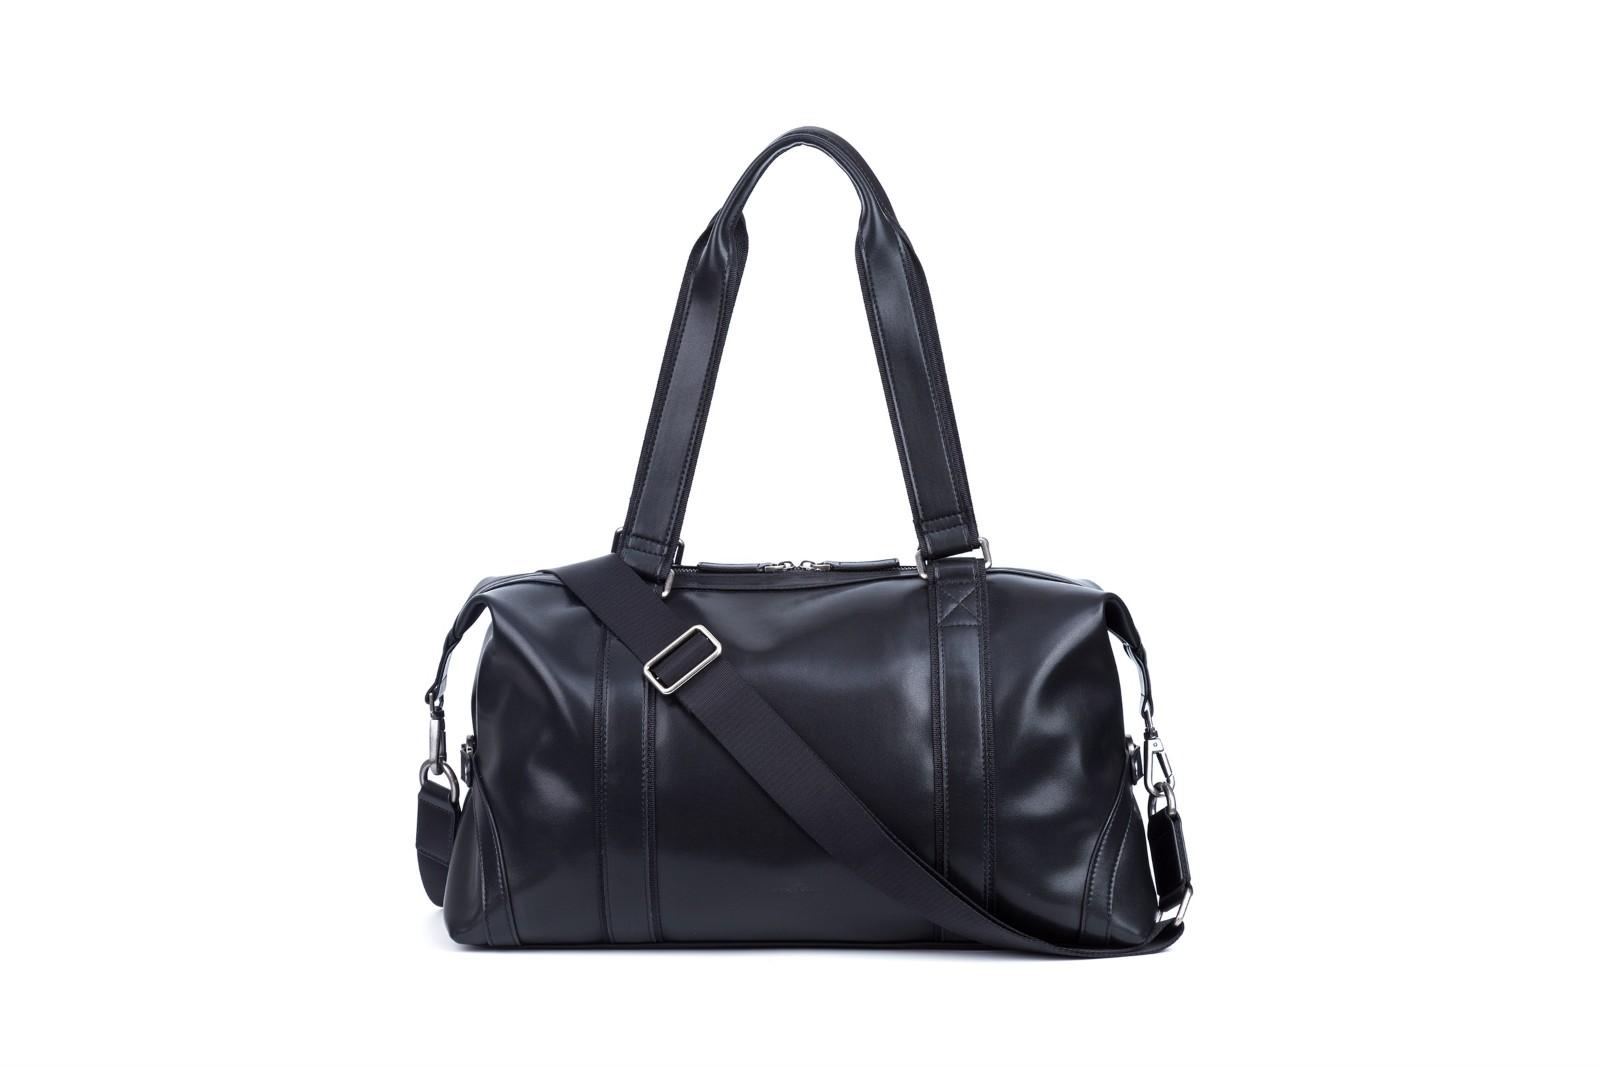 GF bags-Leather Duffle Bag Mens Duffle Leather Handle Metal Zipper Closure-3